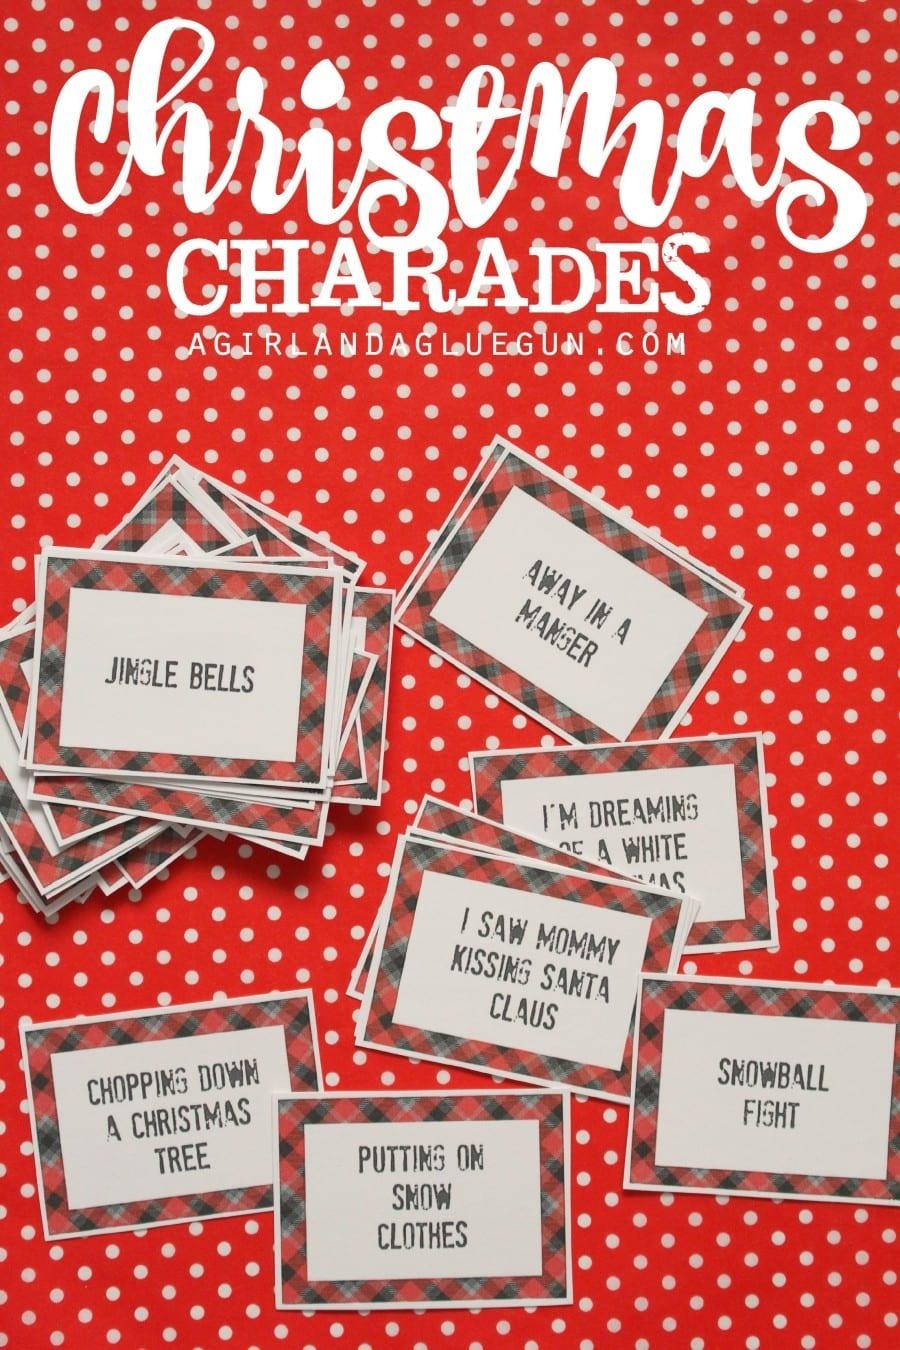 Christmas Charades Game And Free Printable Roundup! - A Girl And A - Free Printable Christmas Charades Cards